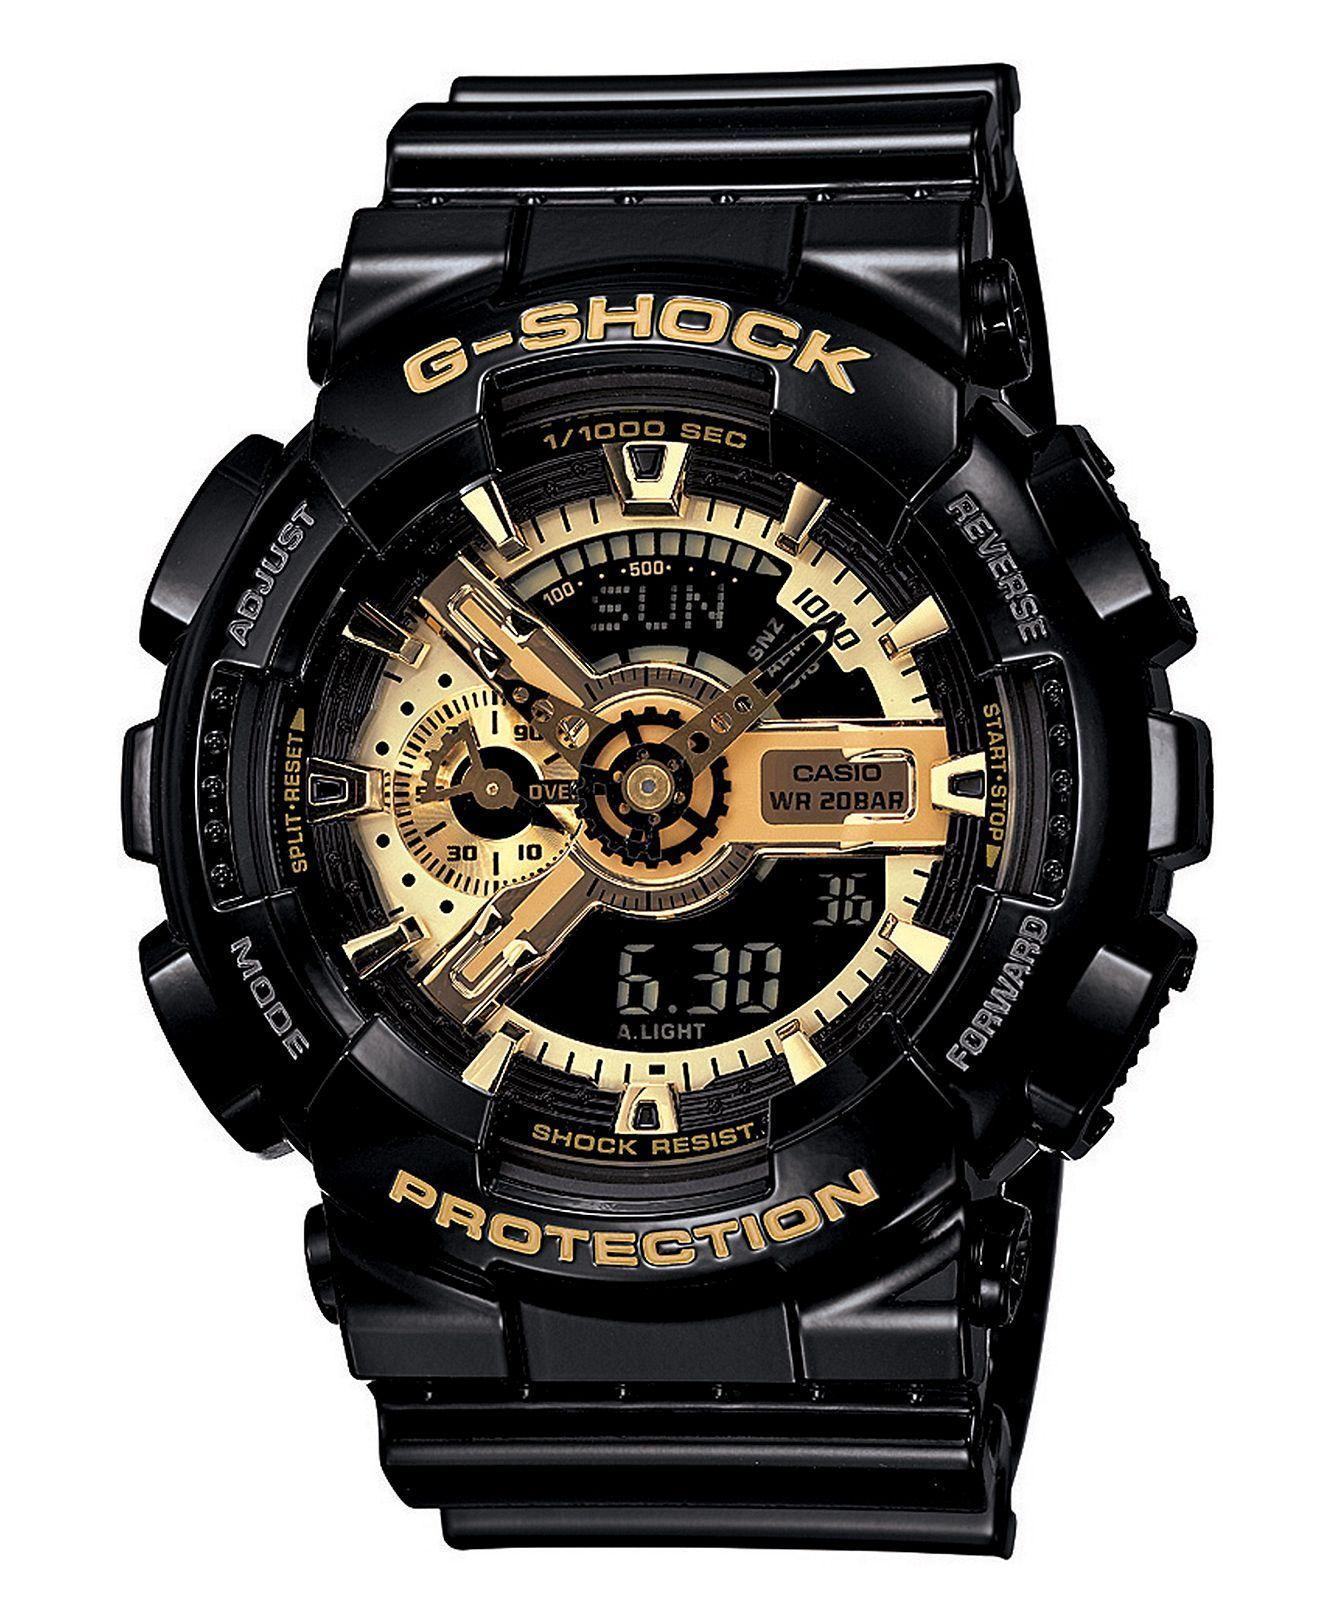 Men's Analog Digital Black Resin Strap Watch G shock